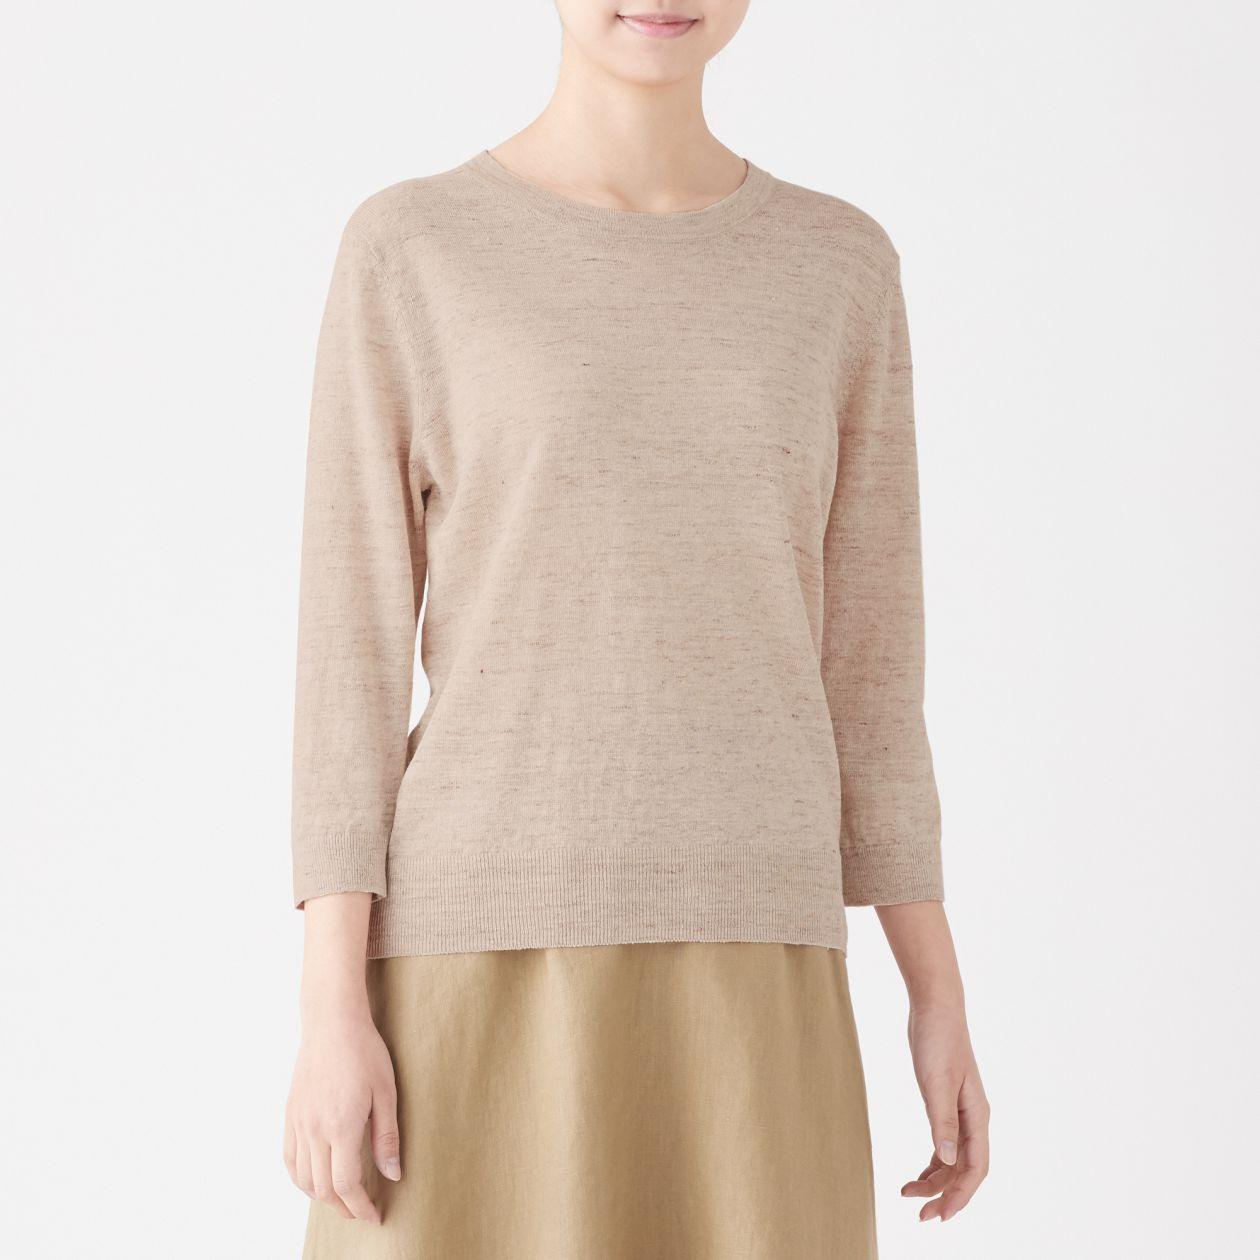 UVカットフレンチリネンラウンドネックセーター